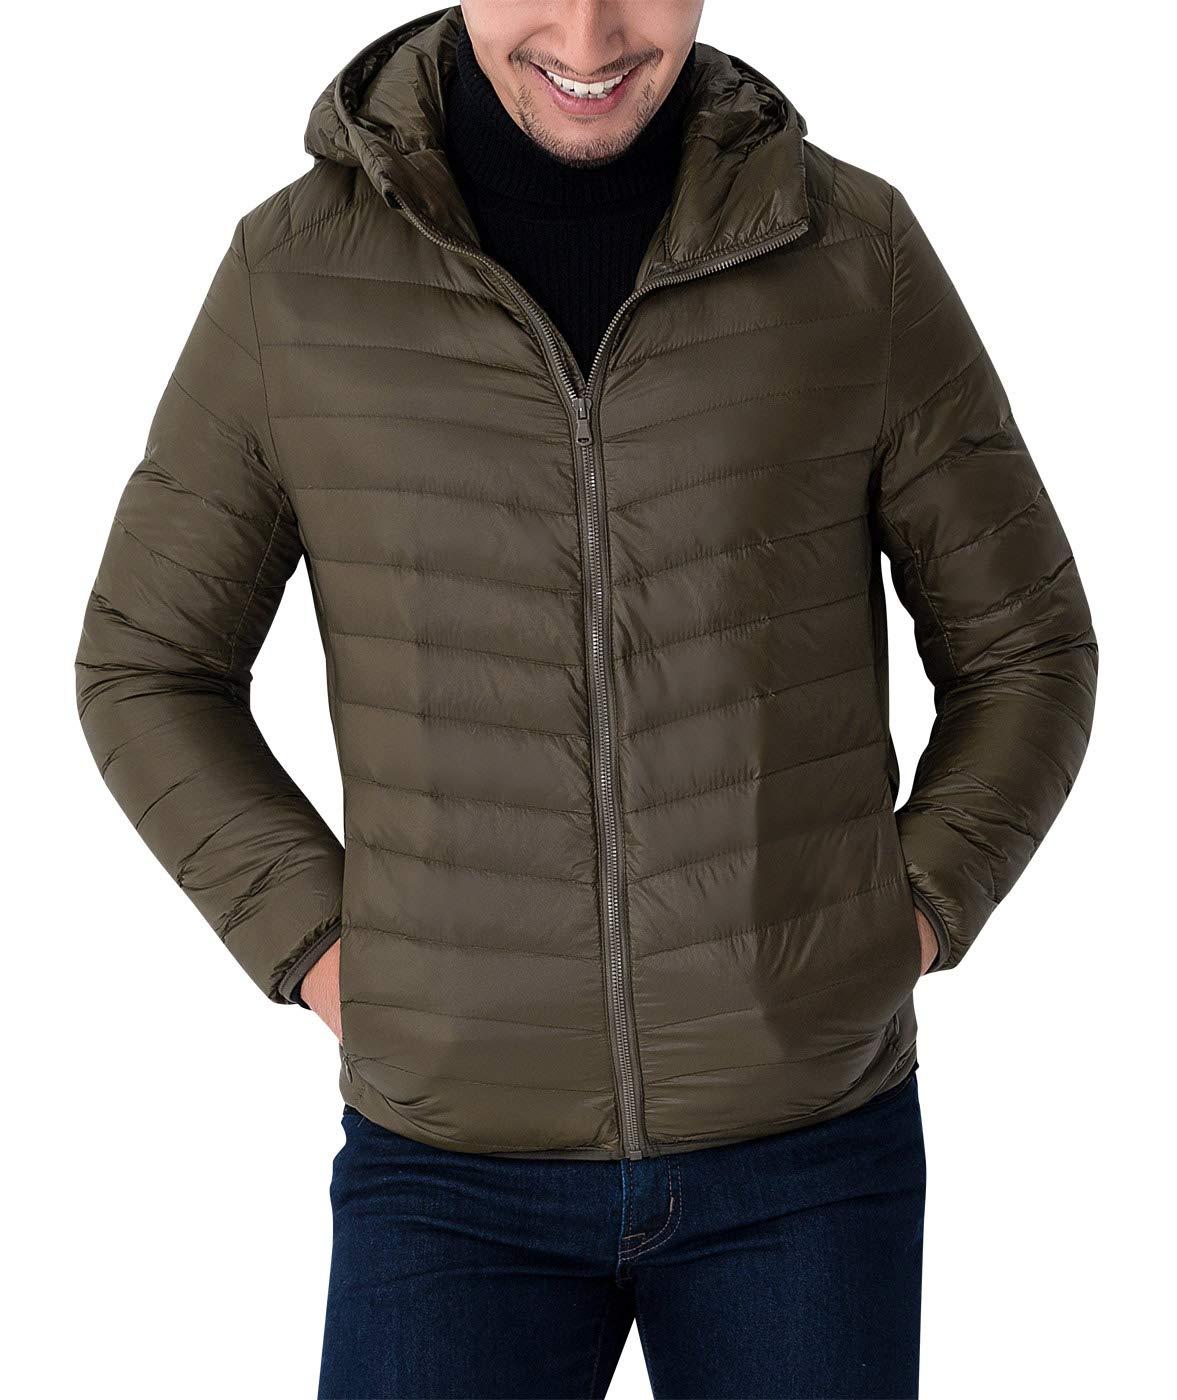 AIEOE Mens Winter Sportwear Down Hoodie Coat Packablee Down Puffer Jacket Outerwear Blue 4XL